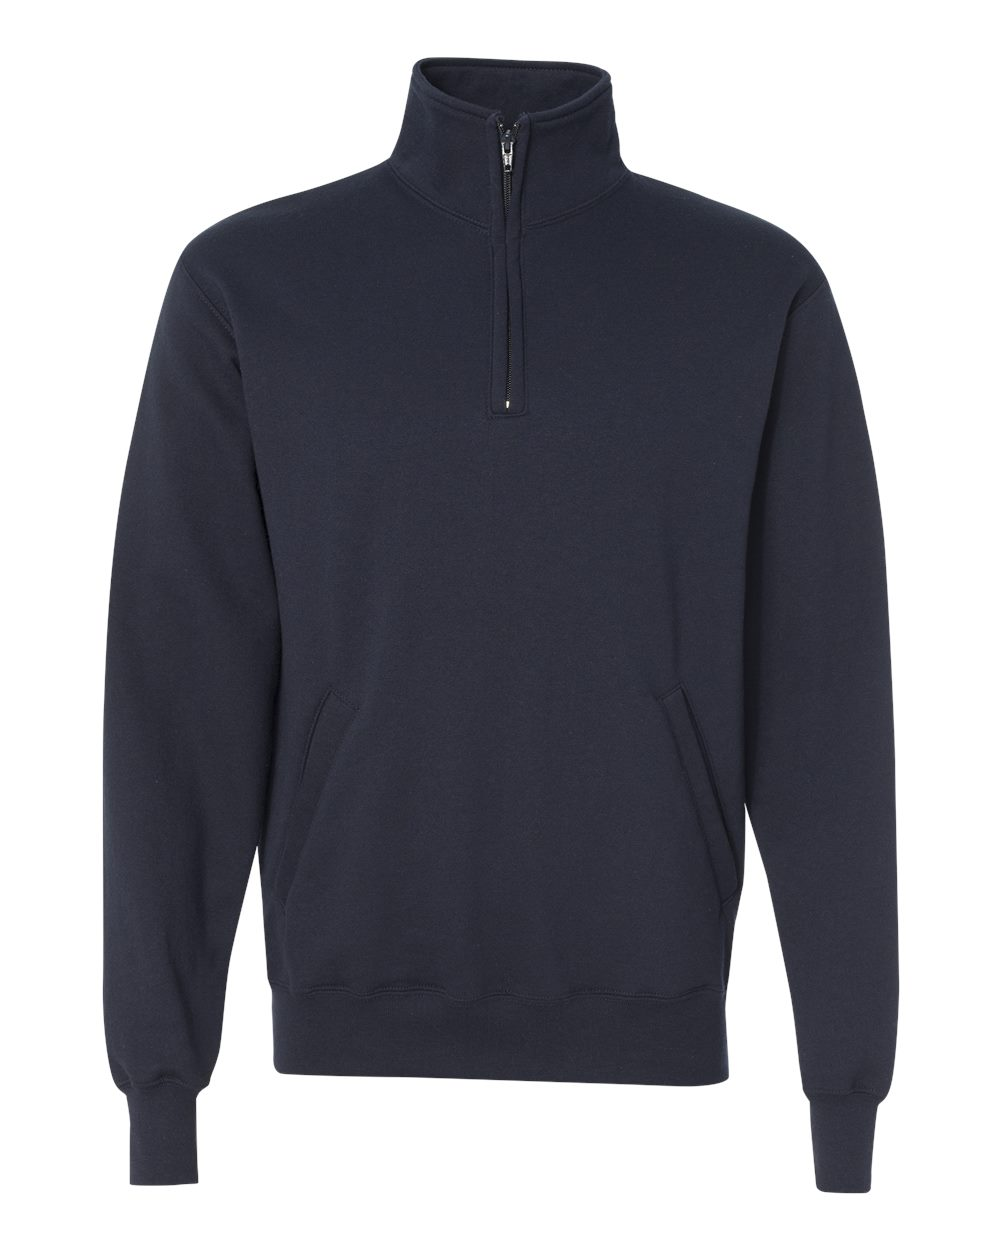 Champion-Mens-Double-Dry-Eco-Quarter-Zip-Pullover-Sweatshirt-S400-up-to-3XL miniature 12